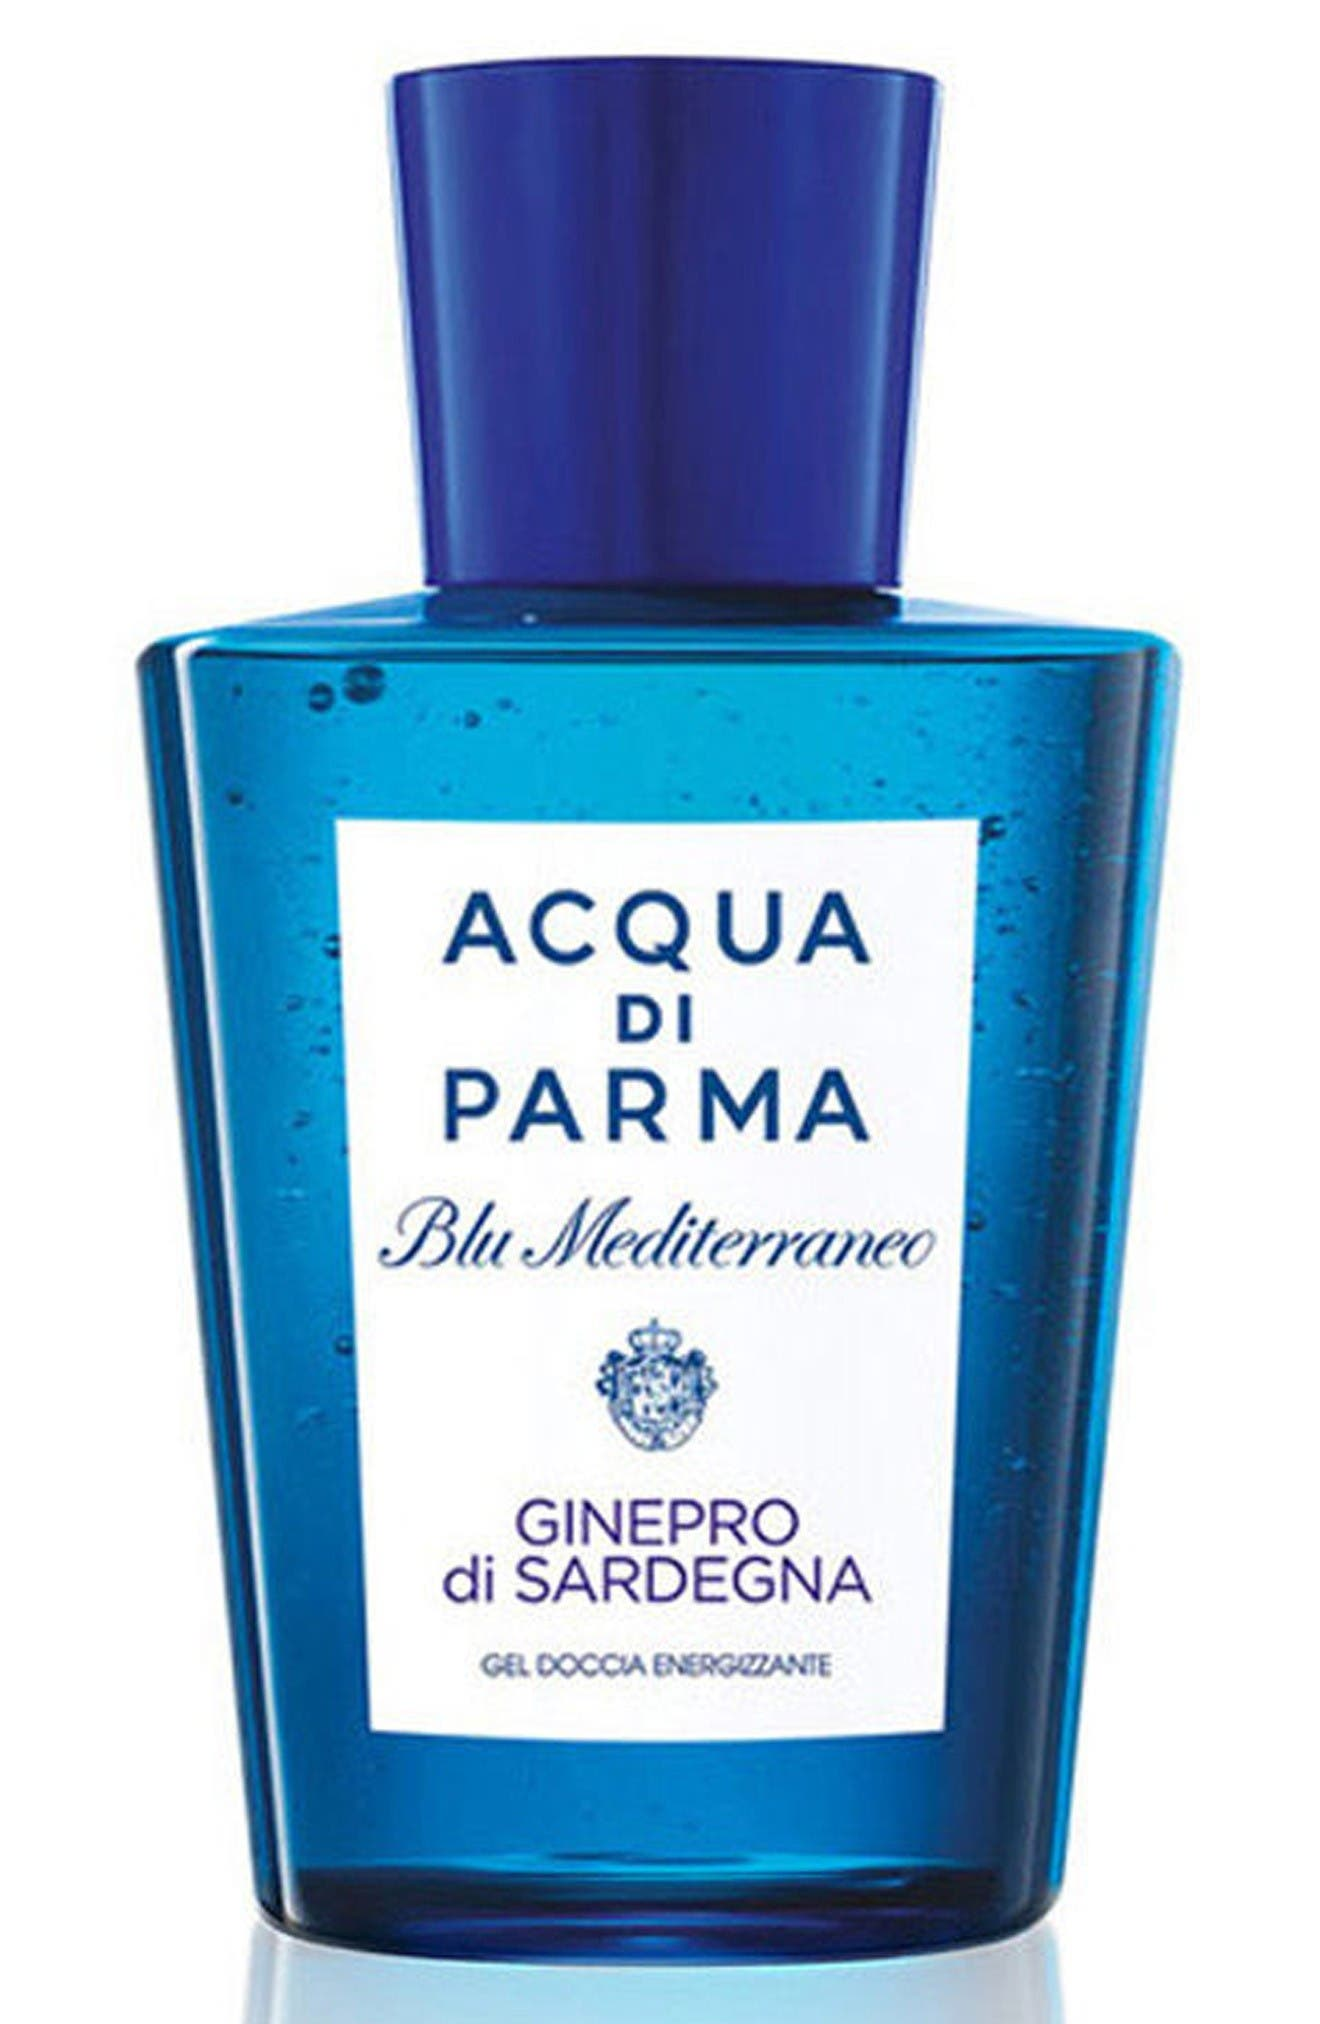 Main Image - Acqua di Parma 'Blu Mediterraneo - Ginepro di Sardegna' Energizing Shower Gel